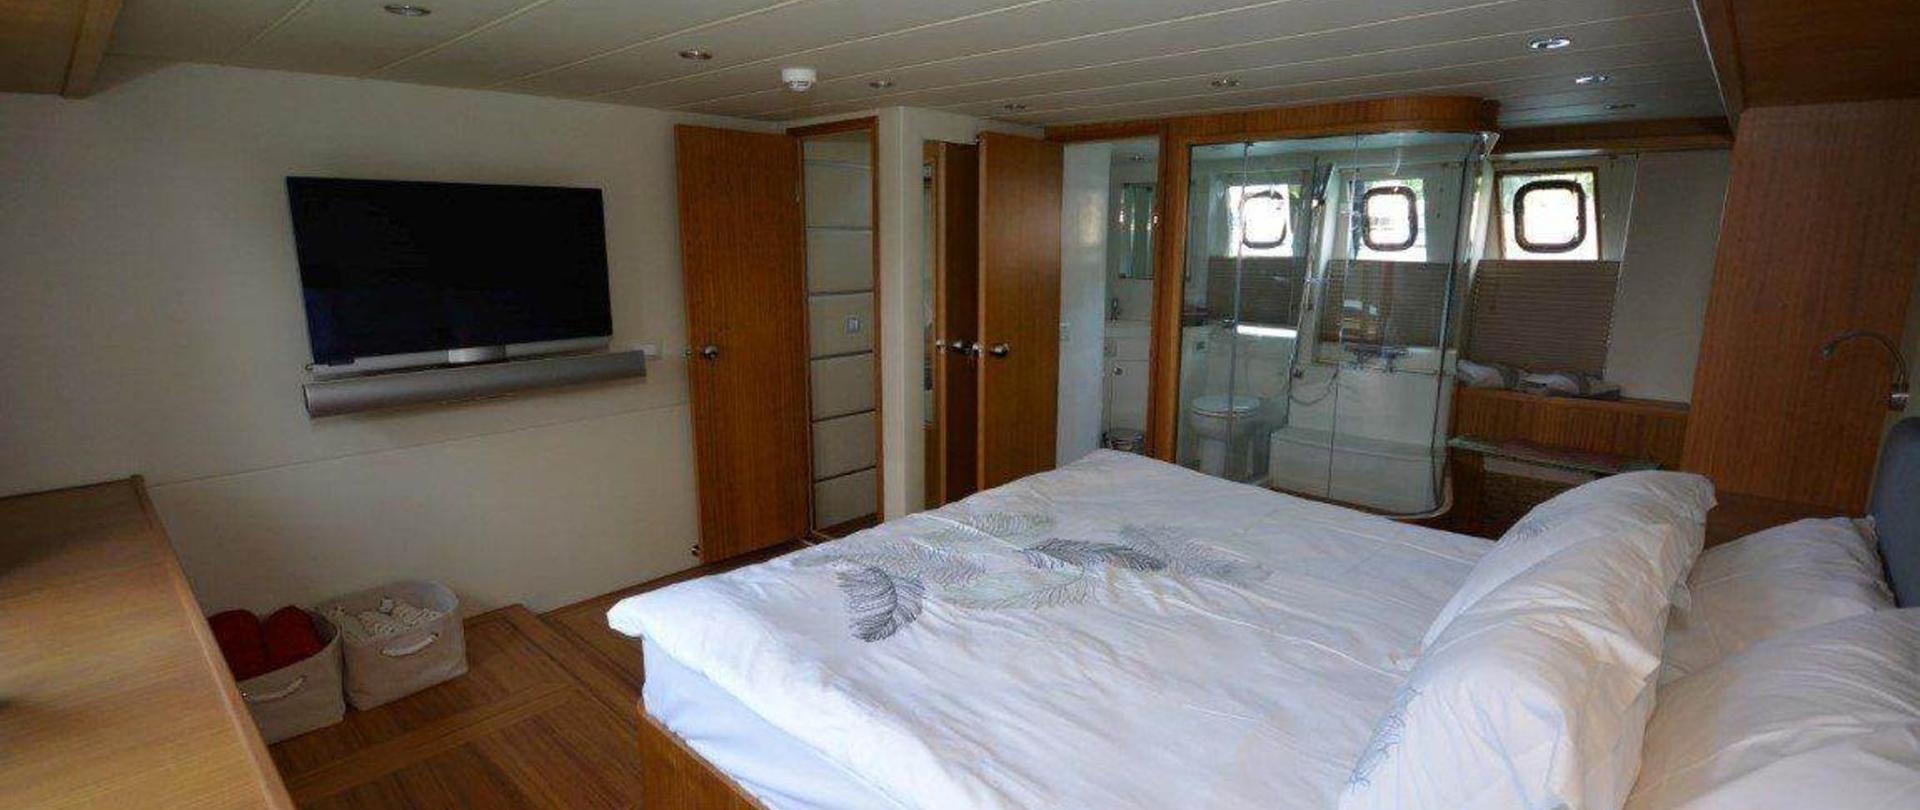 yacht-1-2.jpg